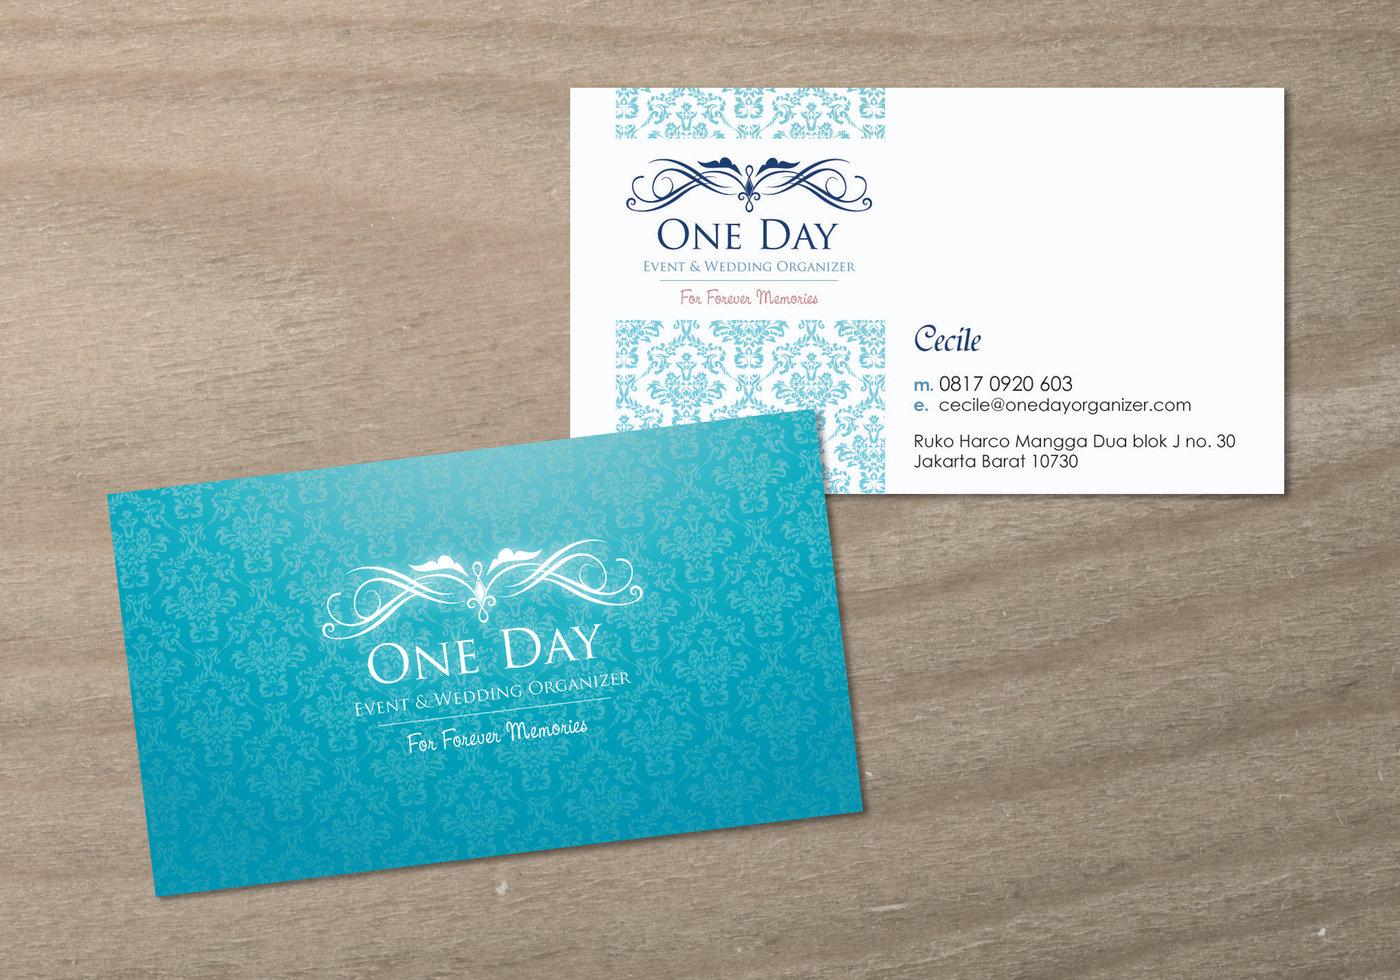 One day business card design by sherly gunawan at coroflot share colourmoves